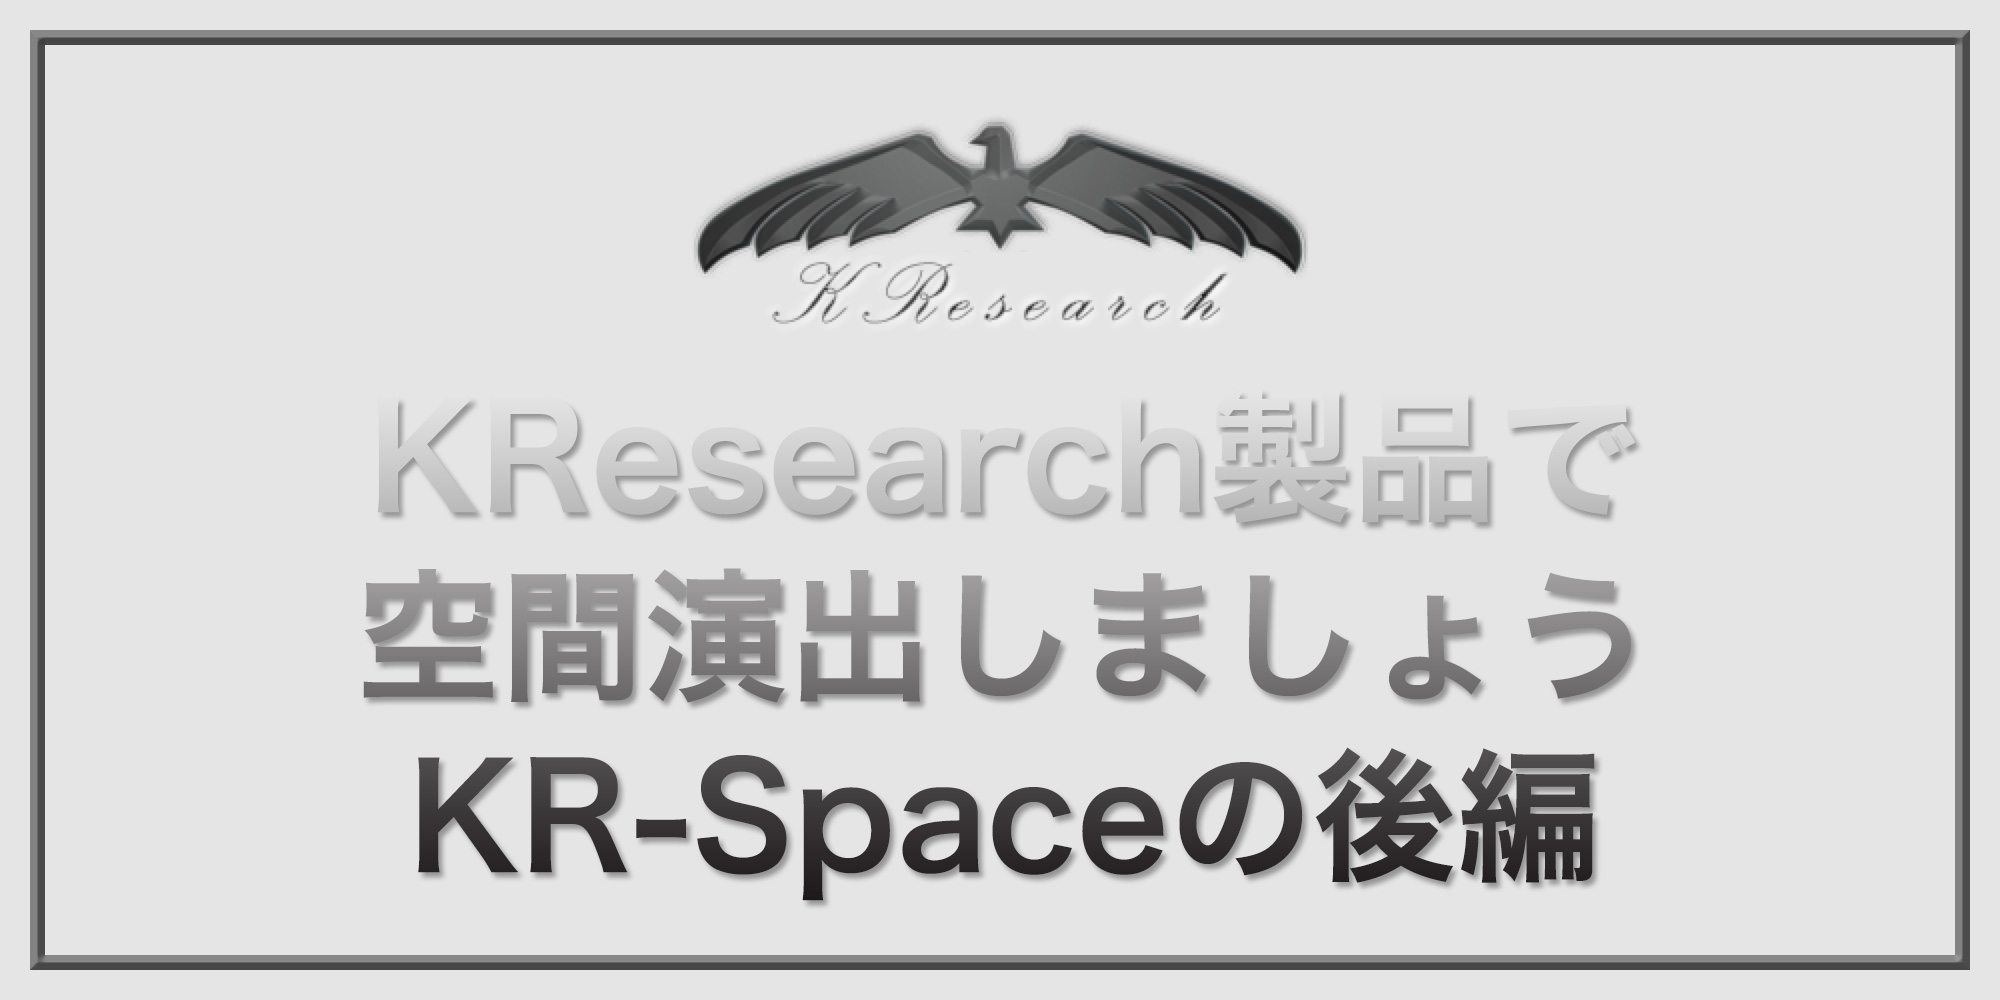 KResearch製品で空間演出しましょう。KR-Spaceの巻後編